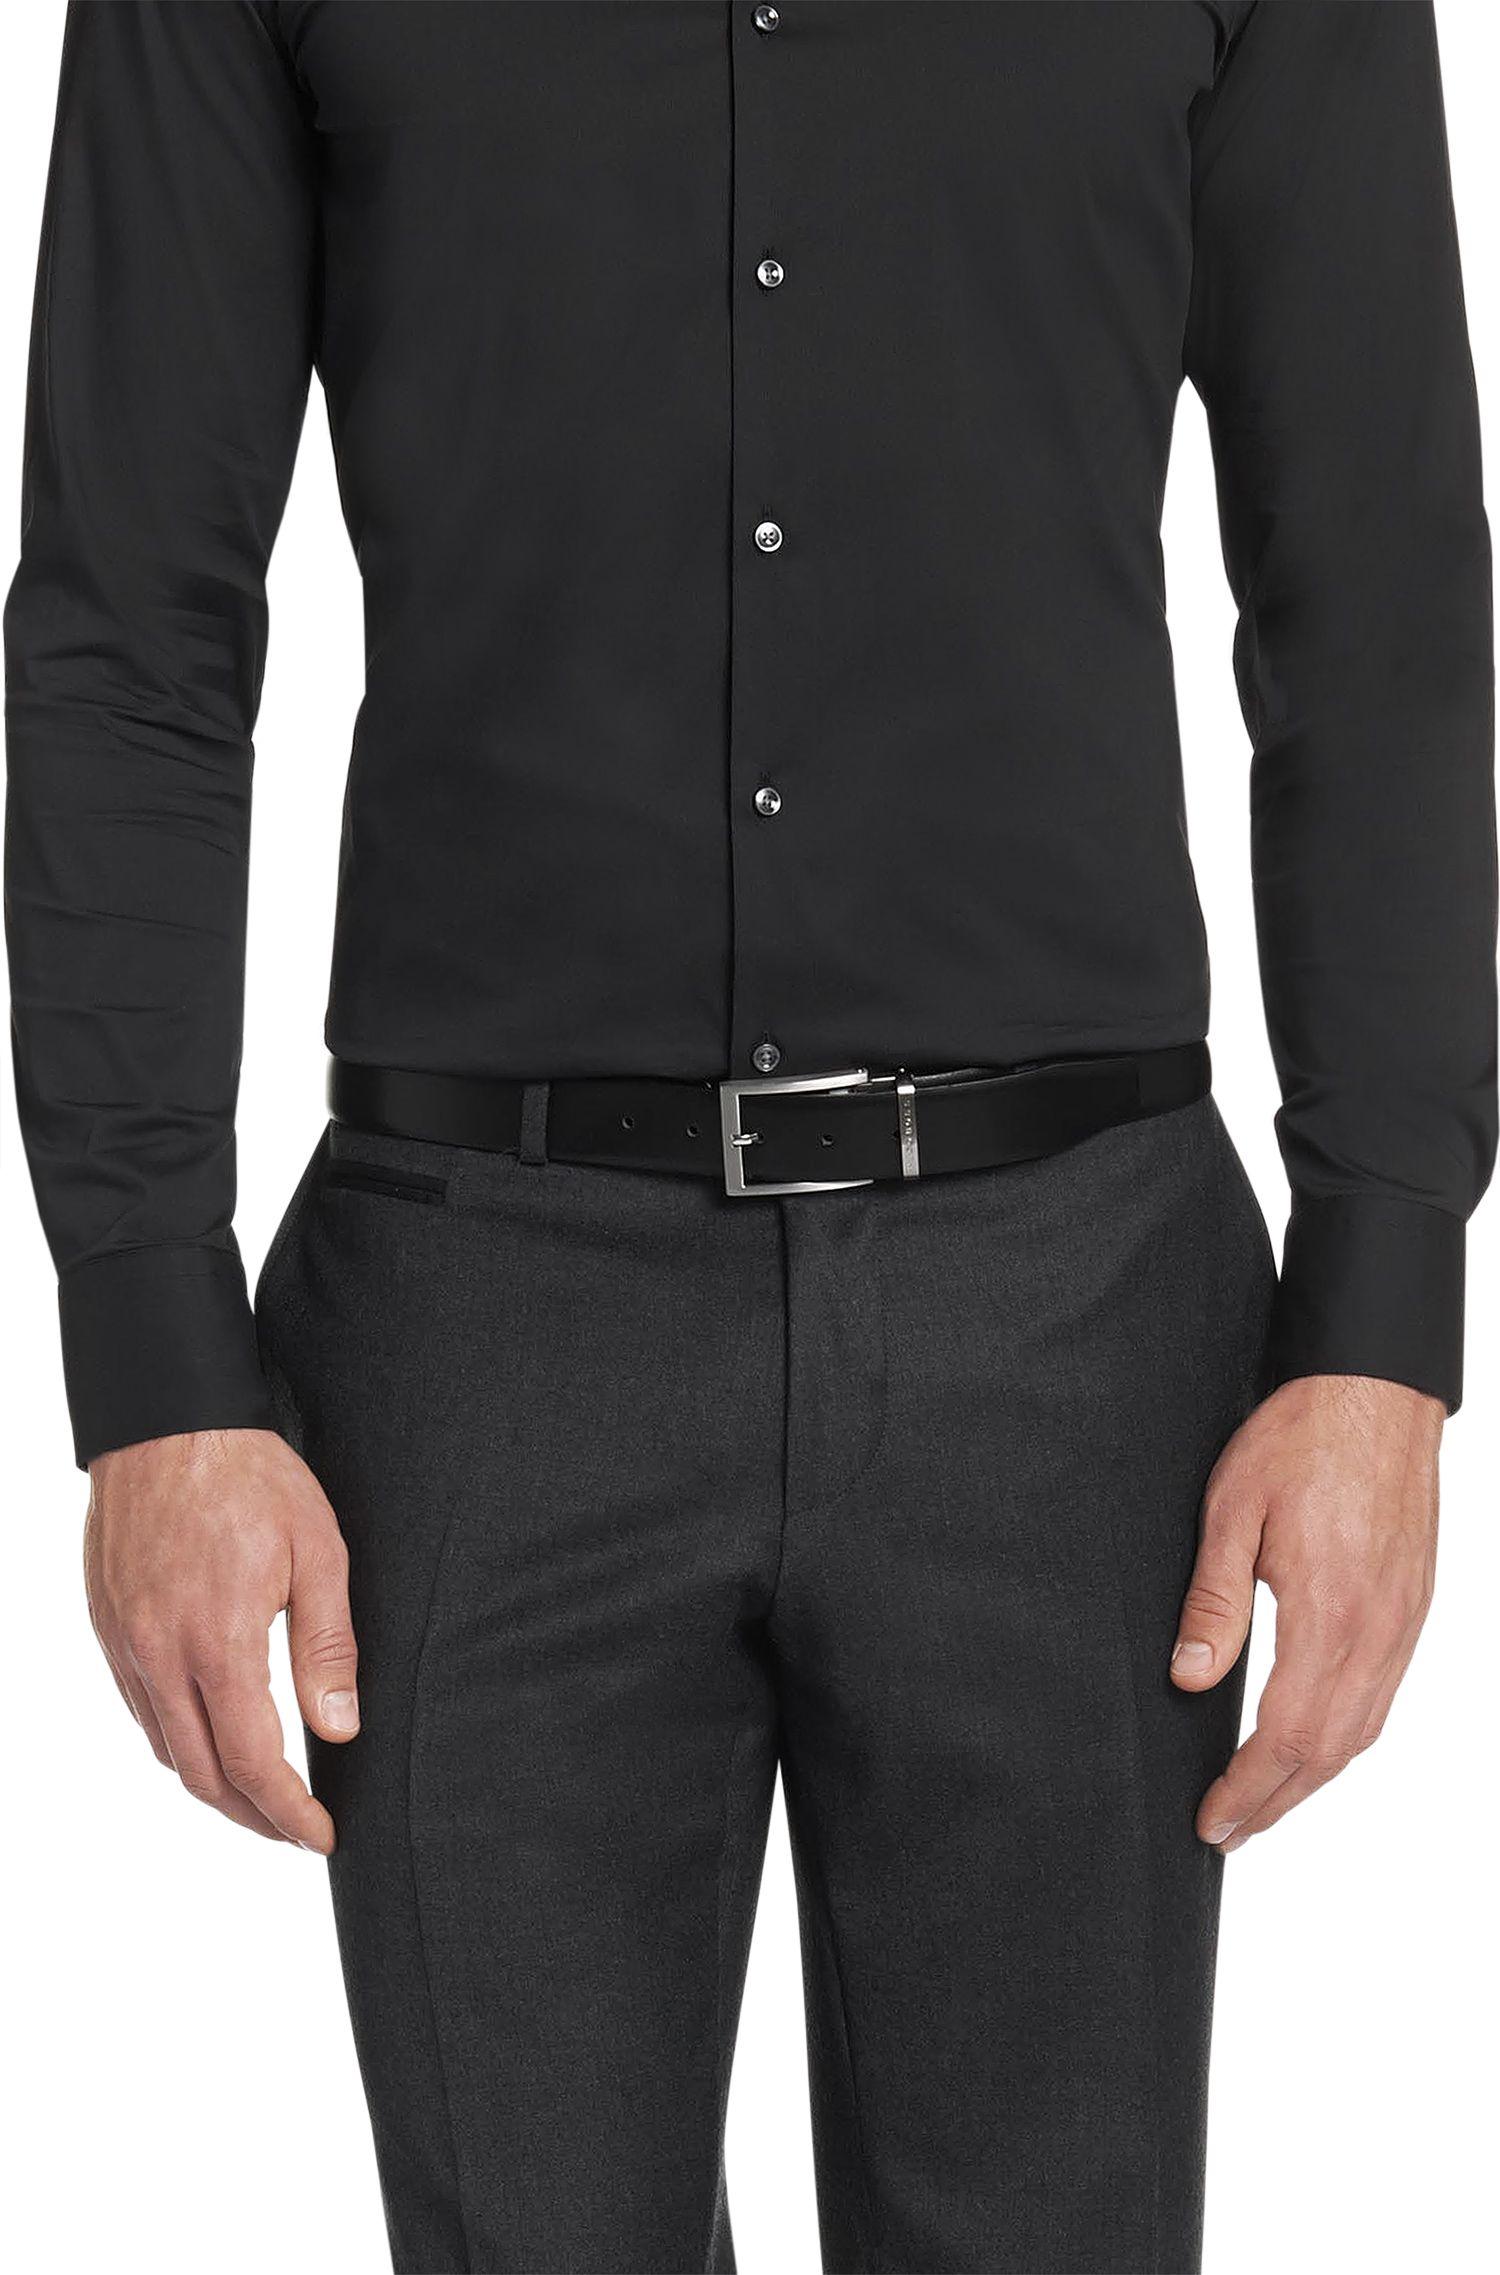 Leather Reversible Belt | Olario CN, Black